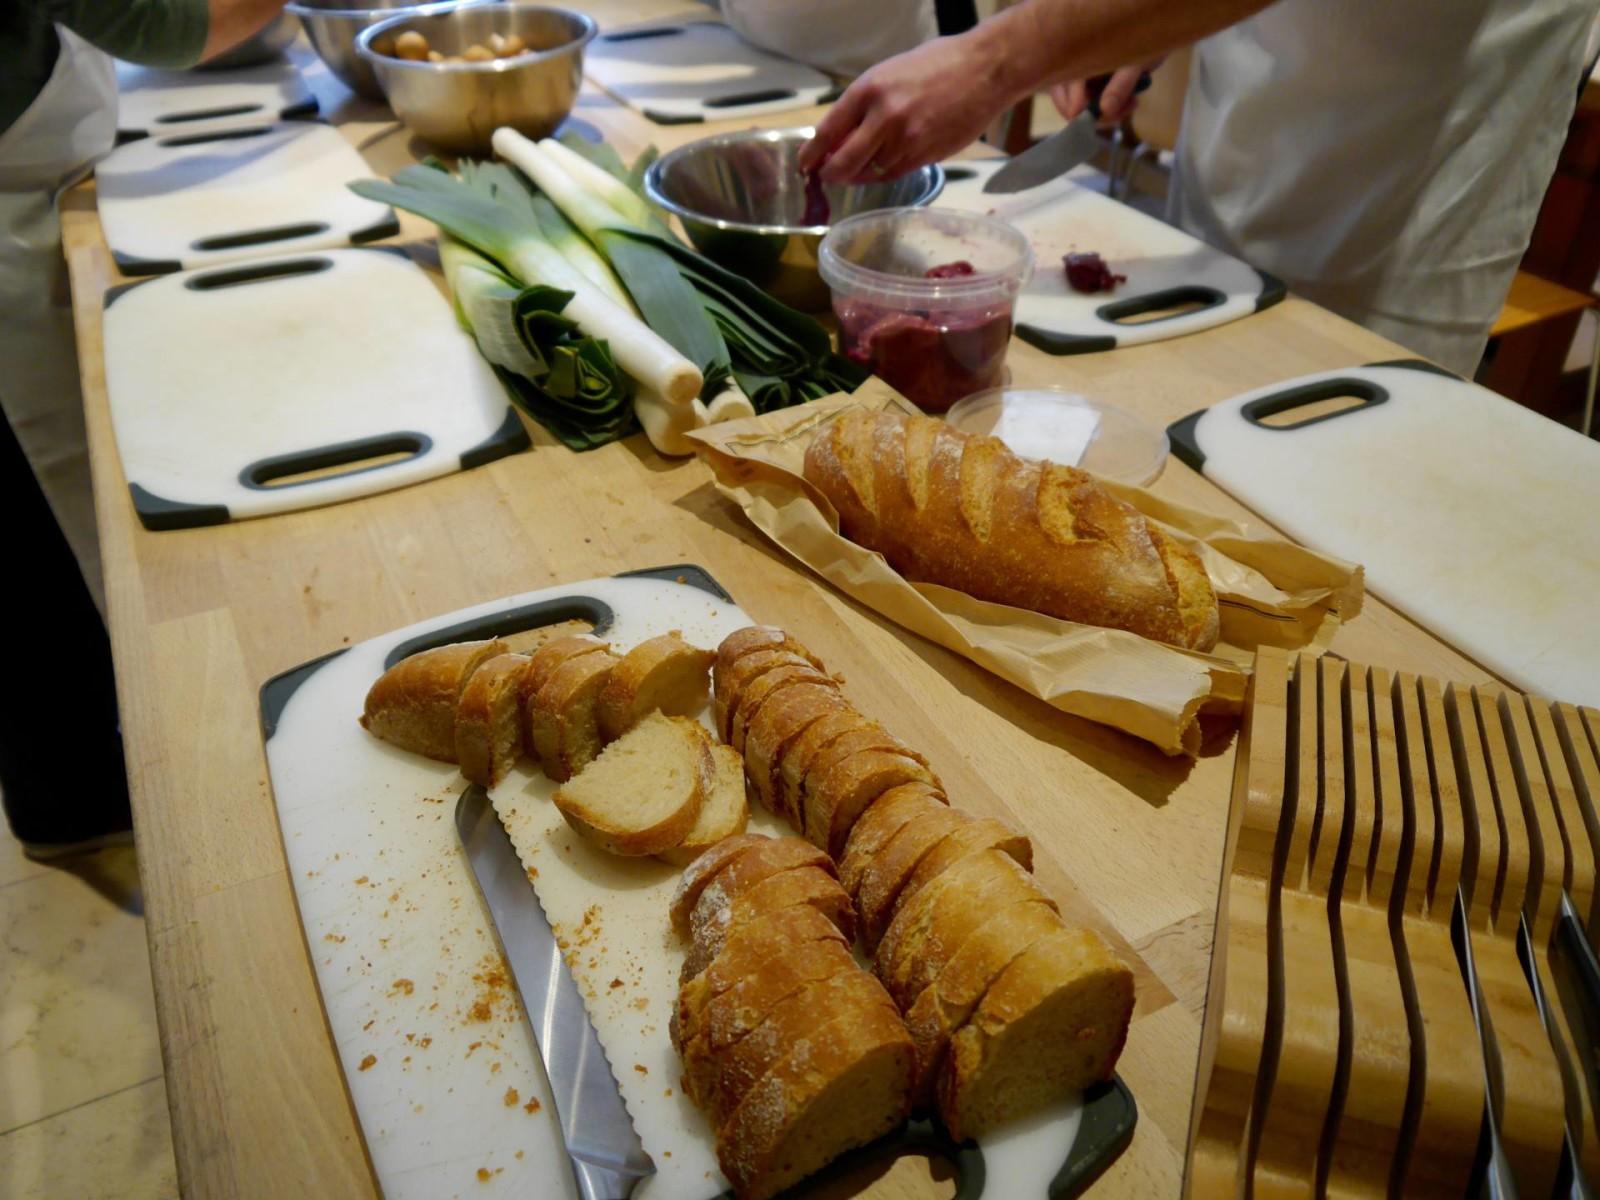 la-cucina-caldesi-cookery-school1